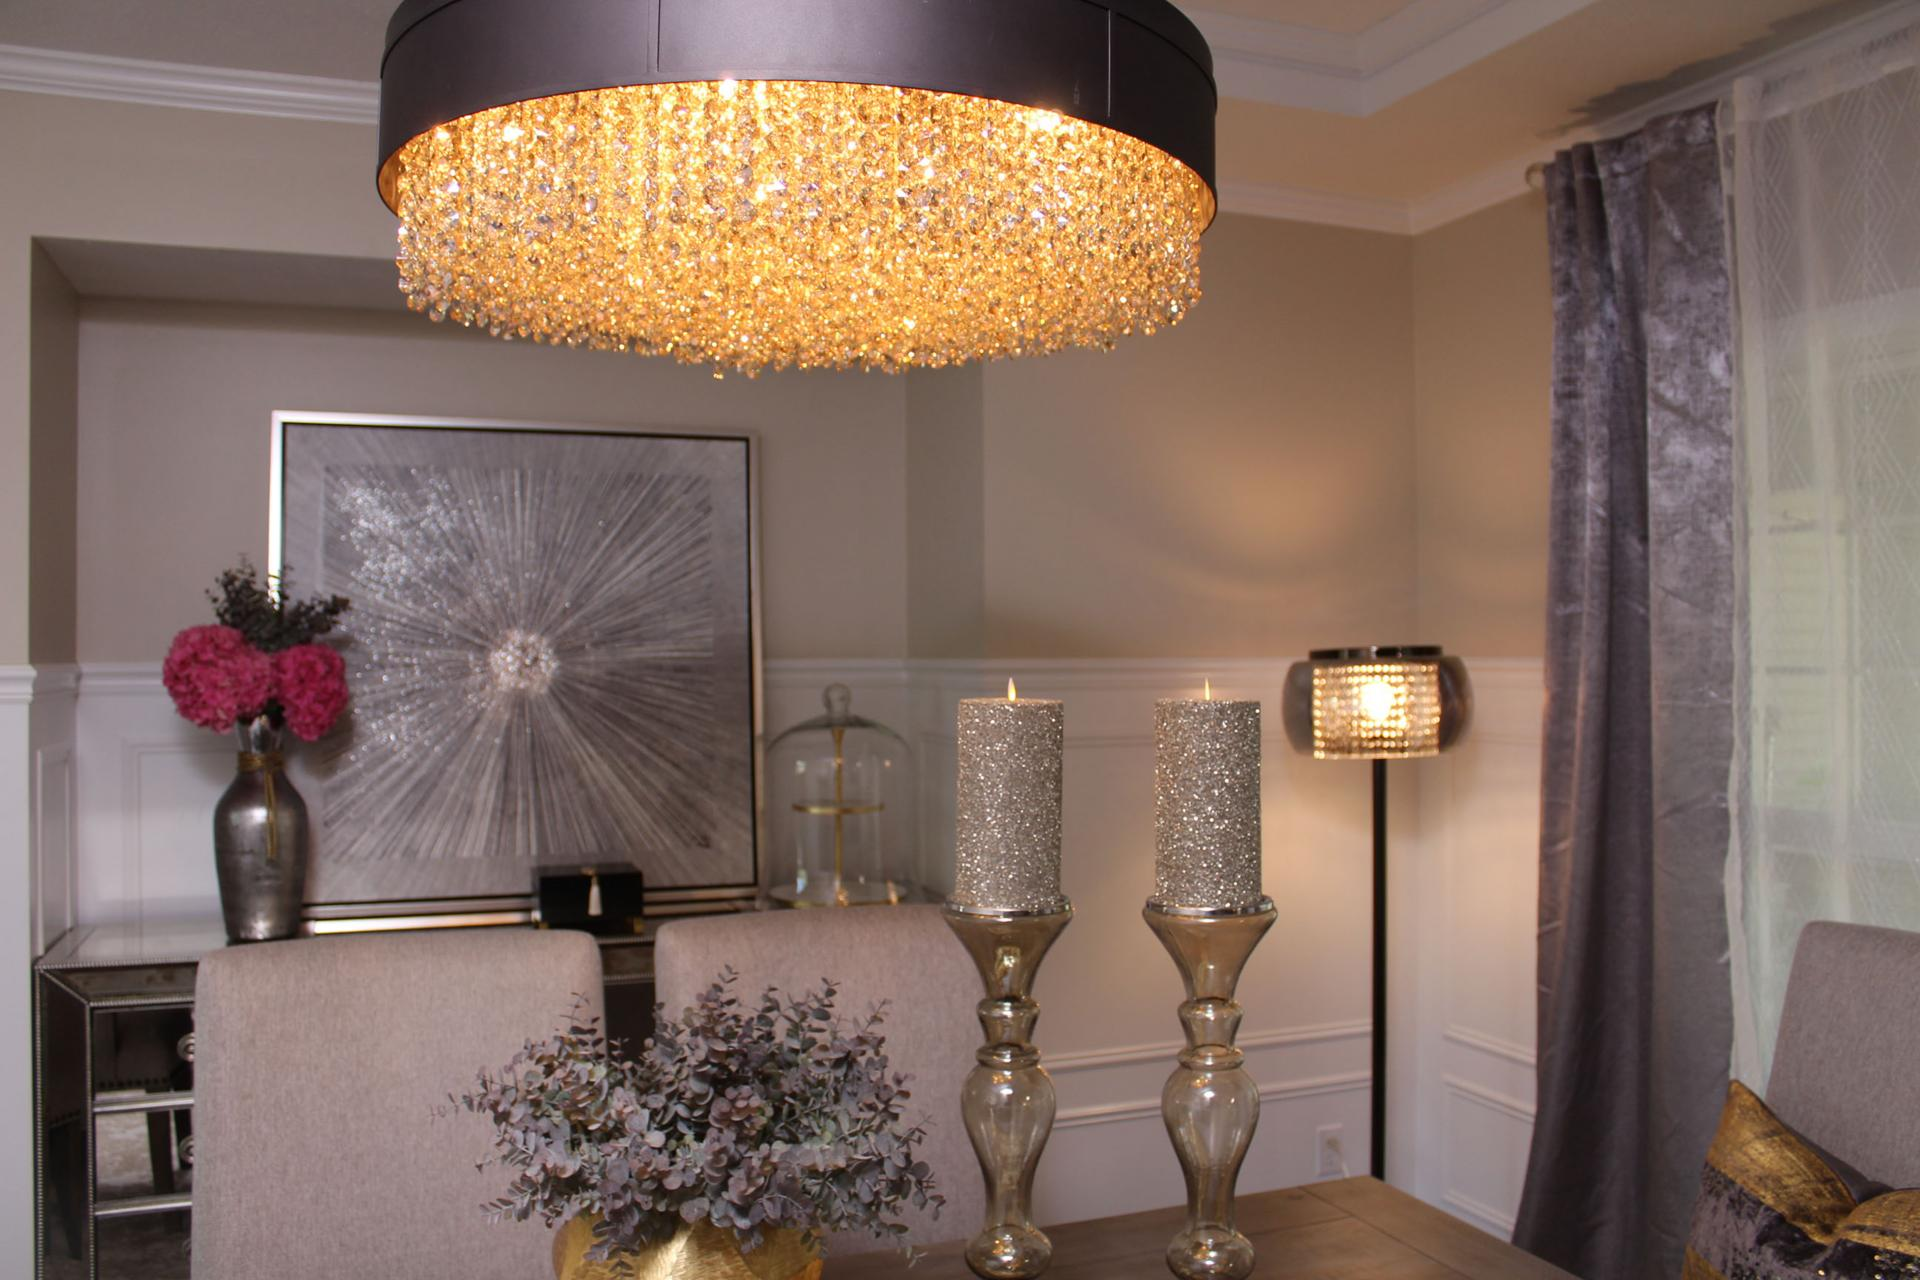 farahjmerhi style insider inspiration room makeover image 16